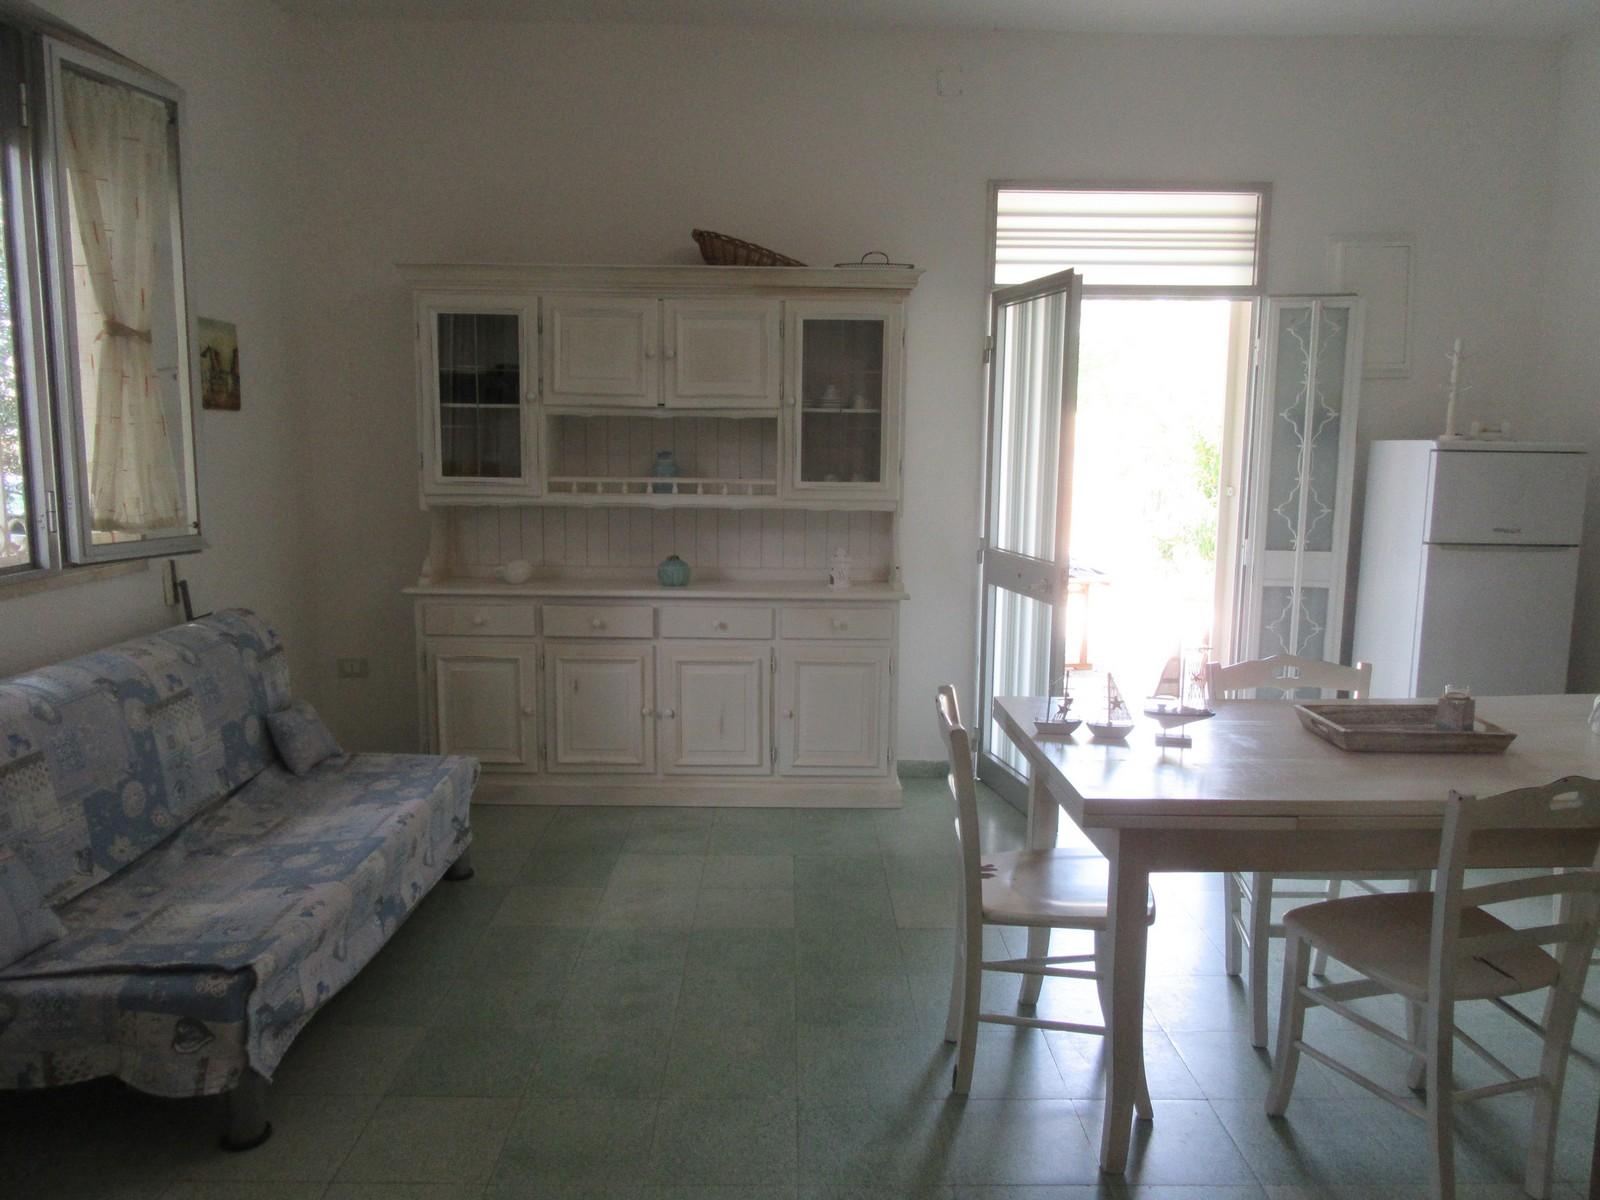 Ferienhaus Villa Mariposa n°1 , only 100 mt from the beach (2354065), Porto Cesareo, Lecce, Apulien, Italien, Bild 4